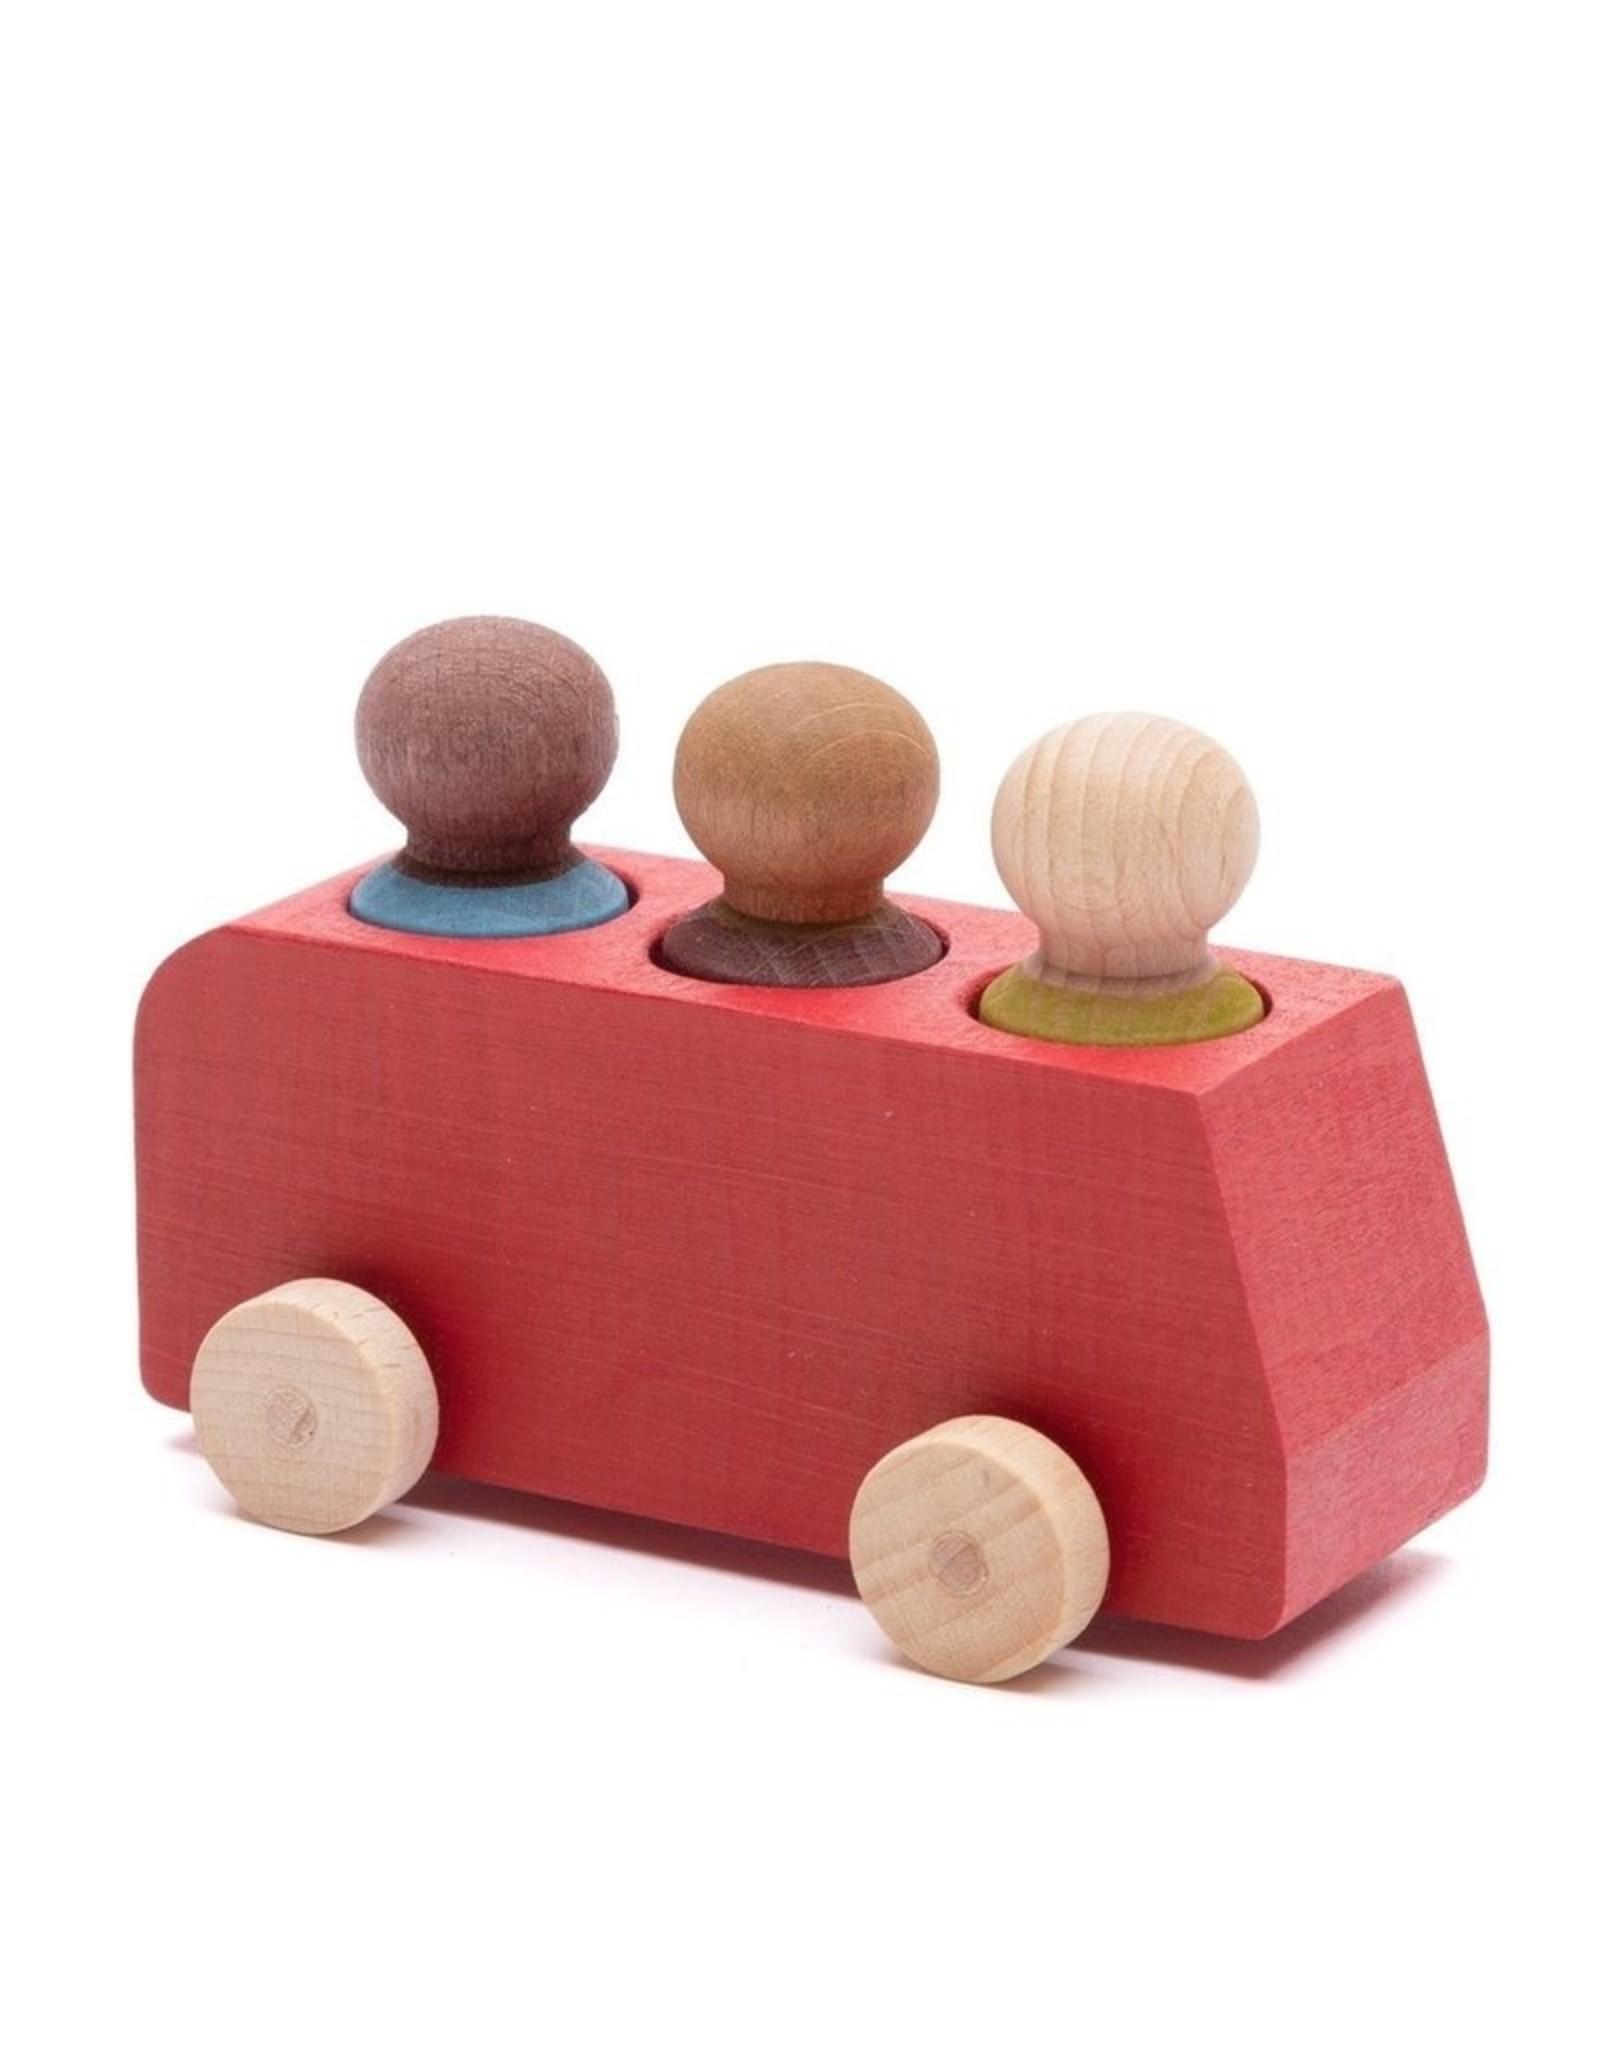 Lubulona  Autobus rouge avec 3 figurines